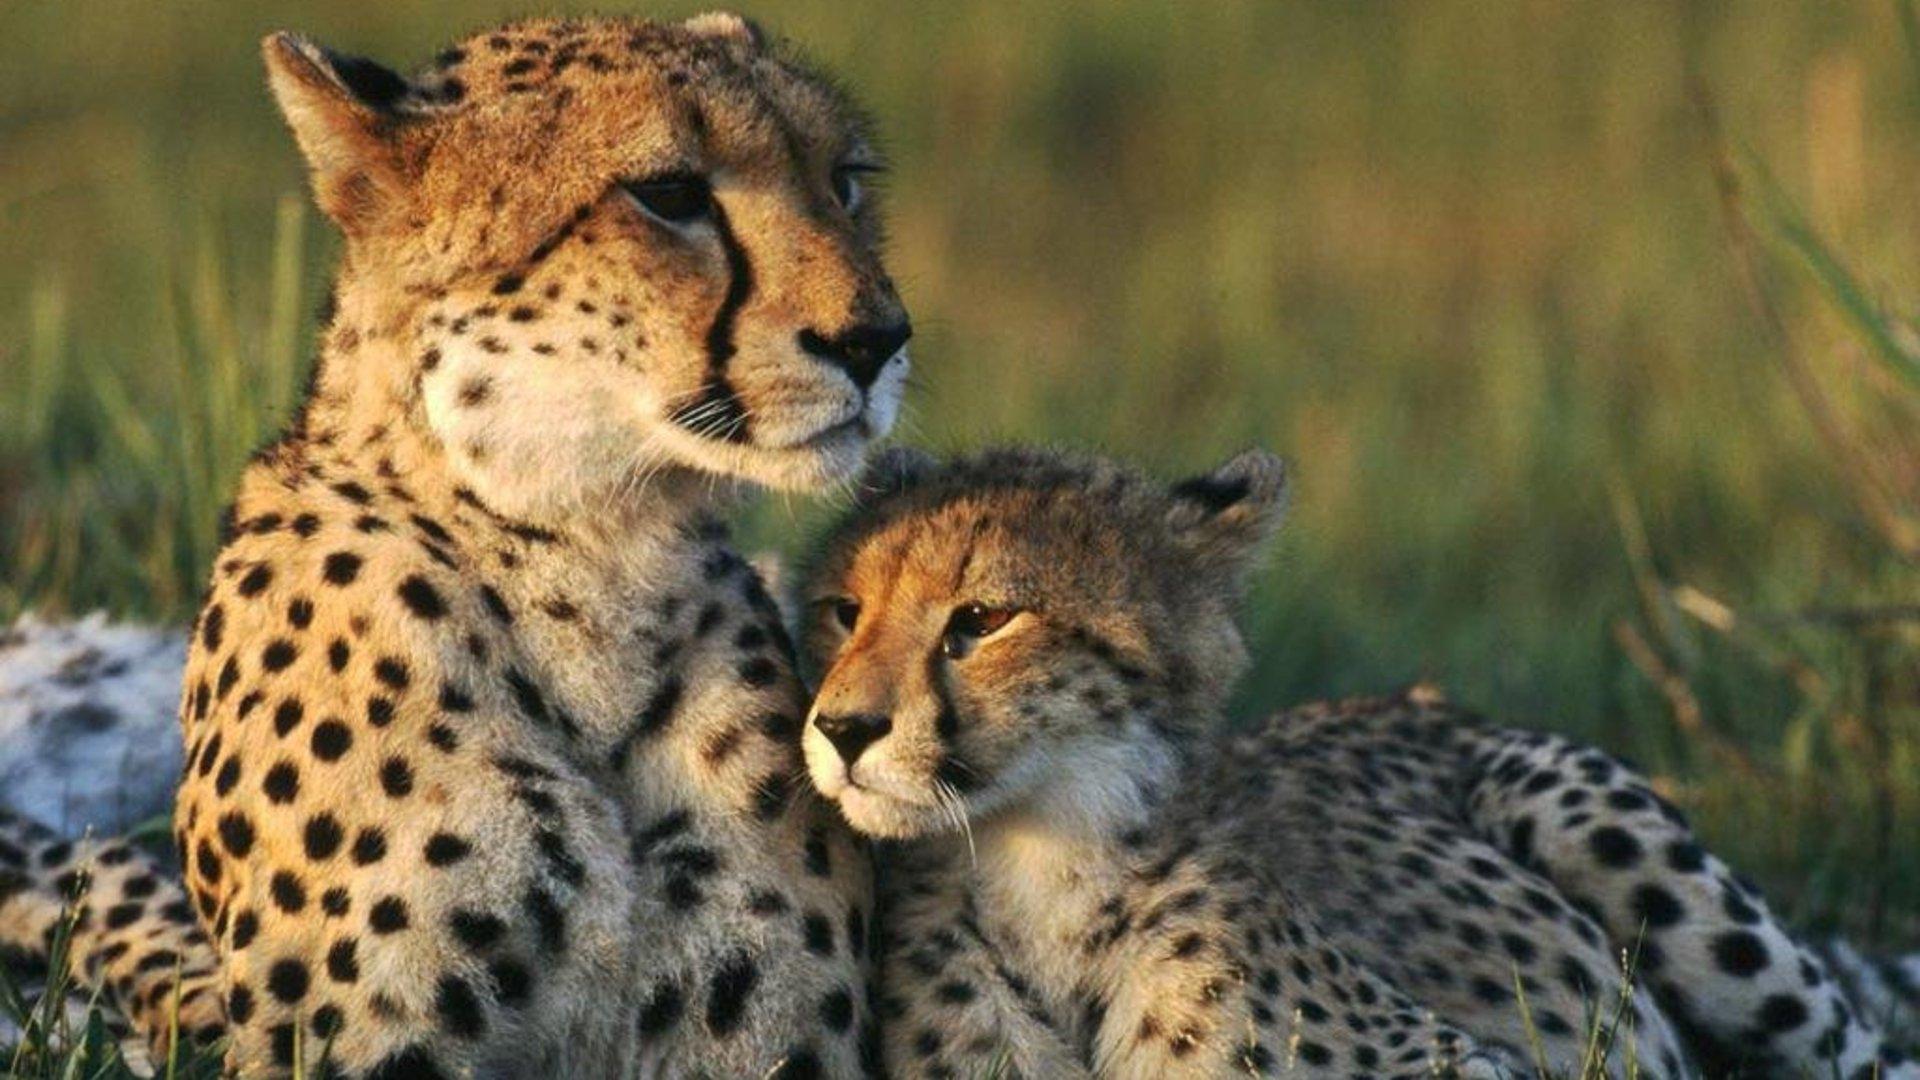 Cute Babies Free Download Wallpapers Cheetah Wallpapers Hd Pixelstalk Net